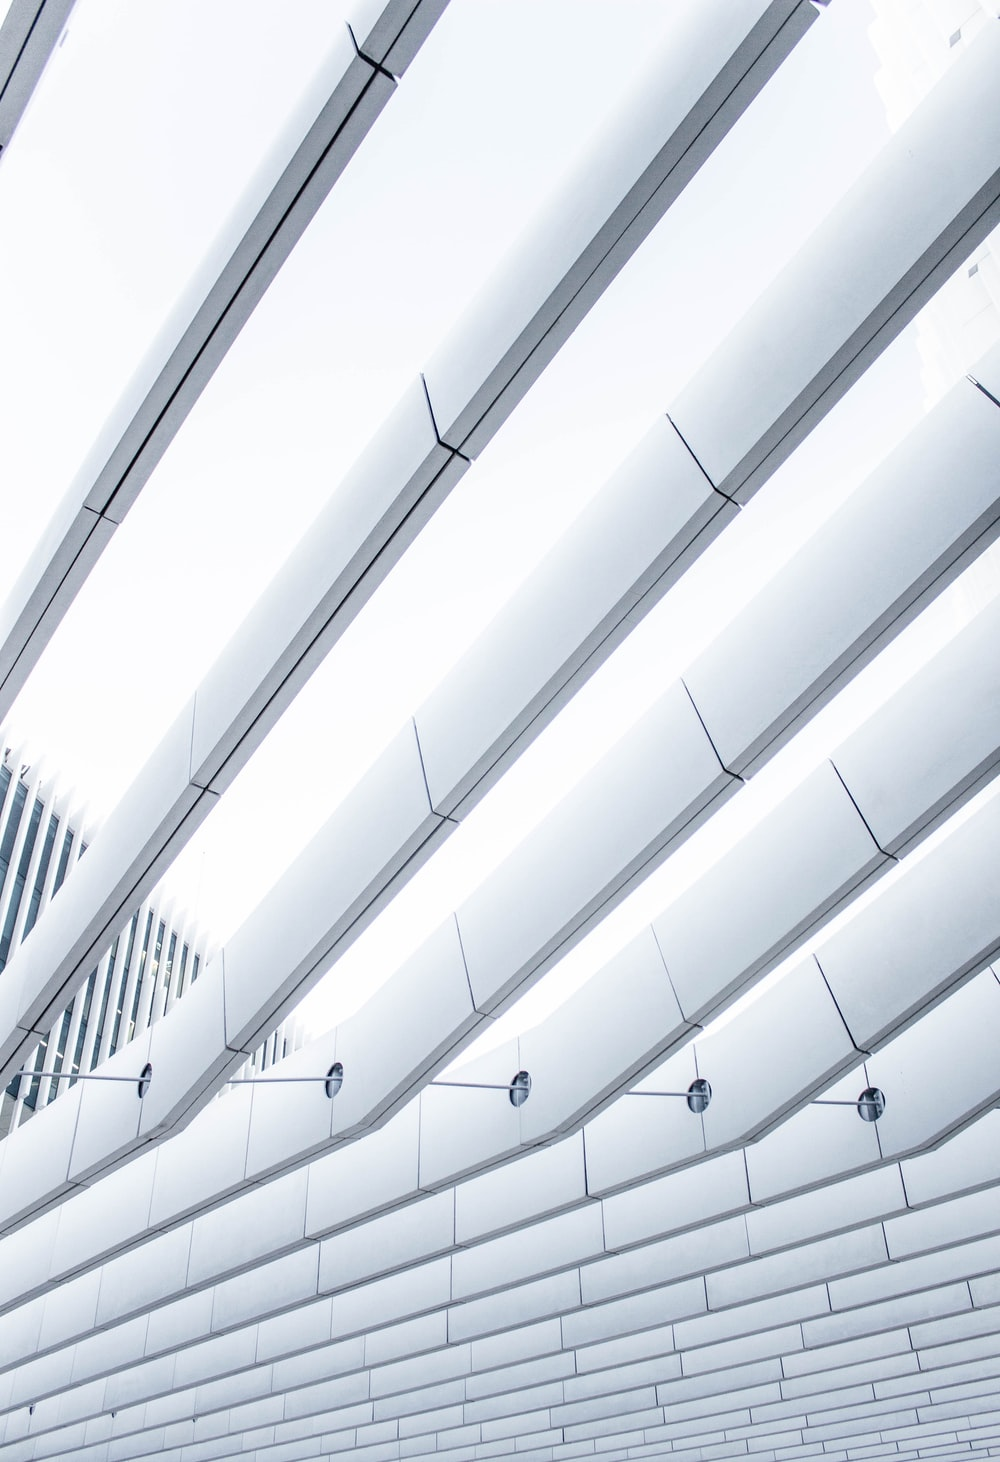 white ceiling during daytime